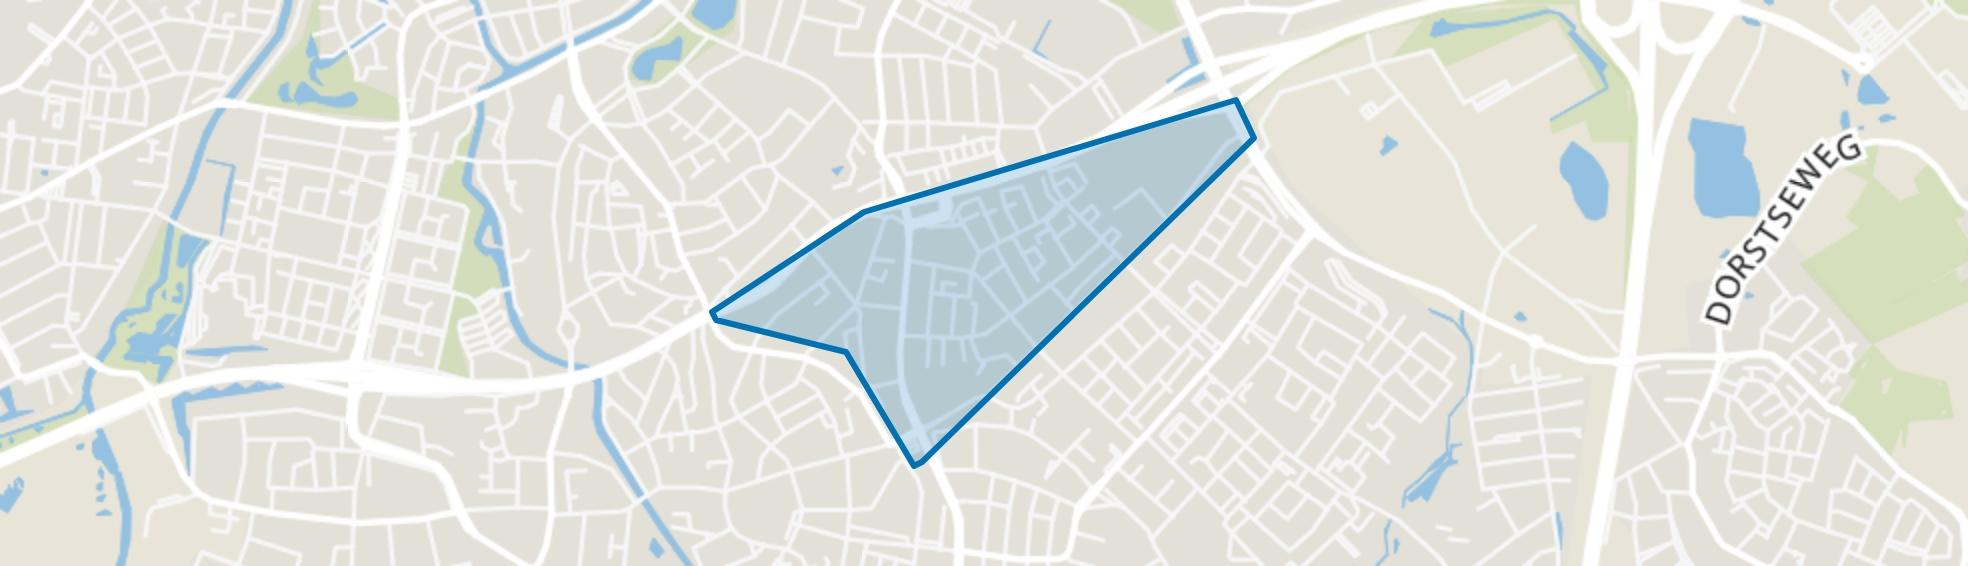 Blauwe Kei, Breda map